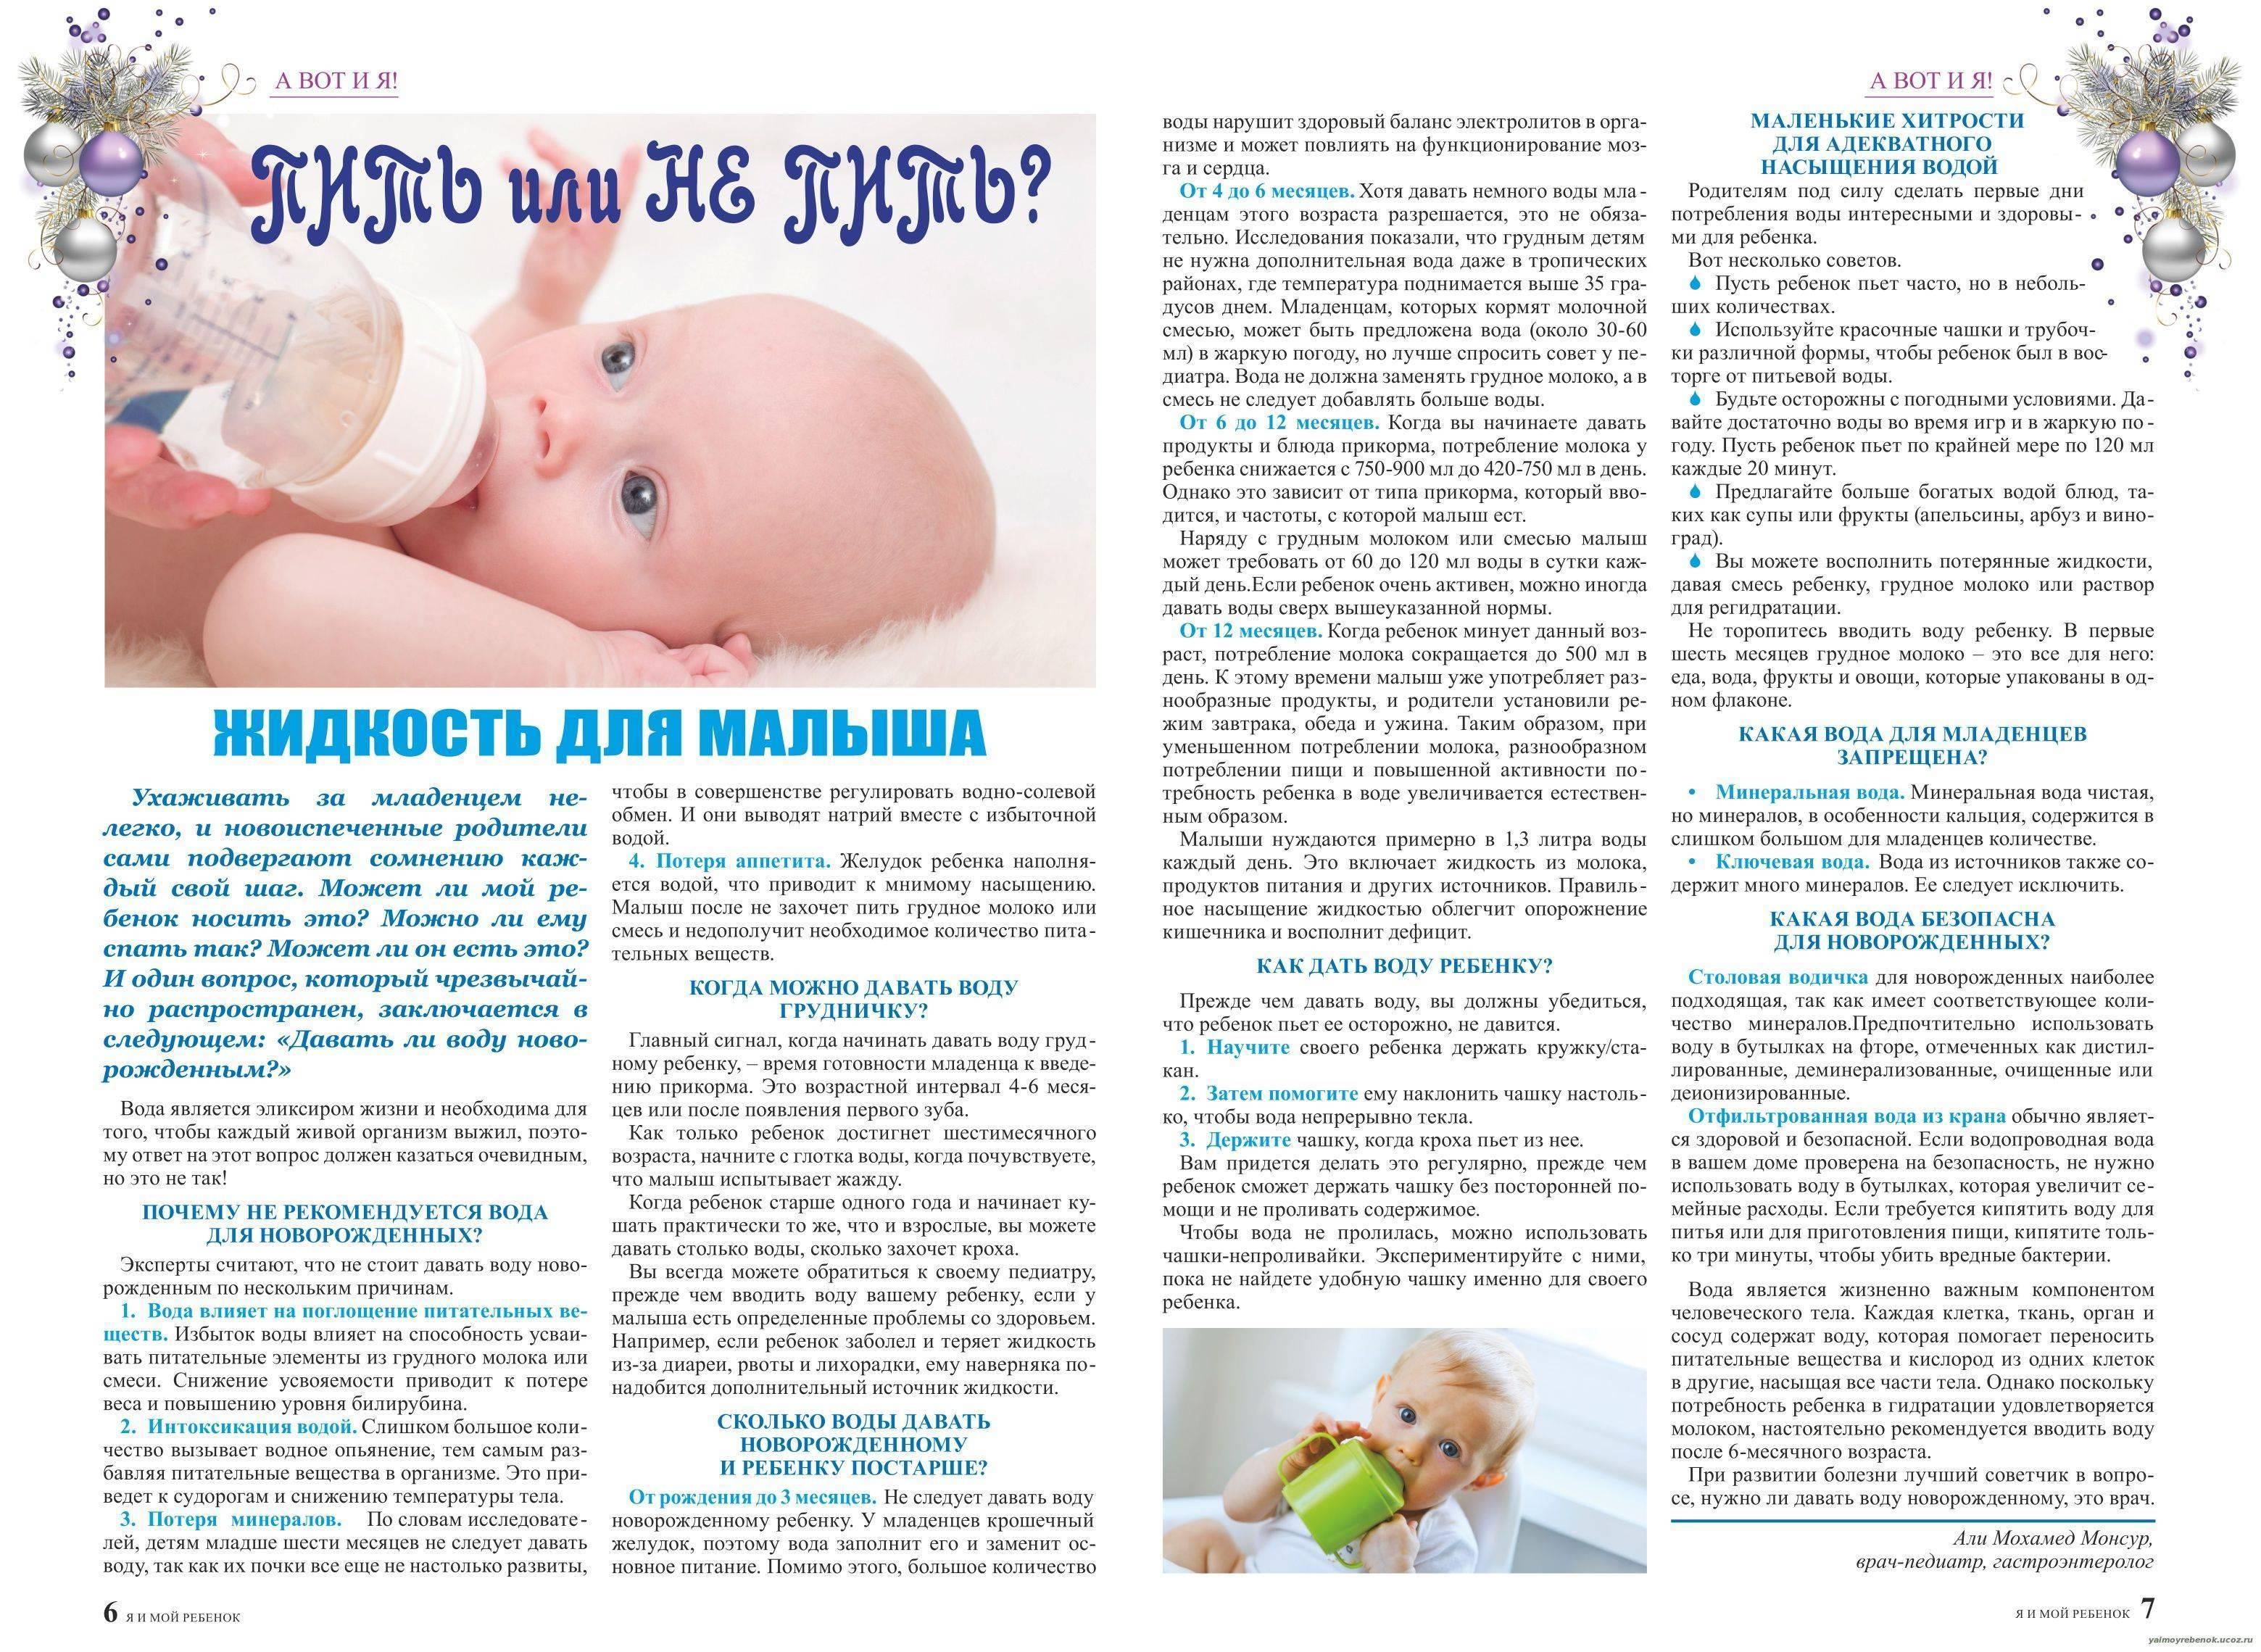 Хватает ли ребенку грудного молока?